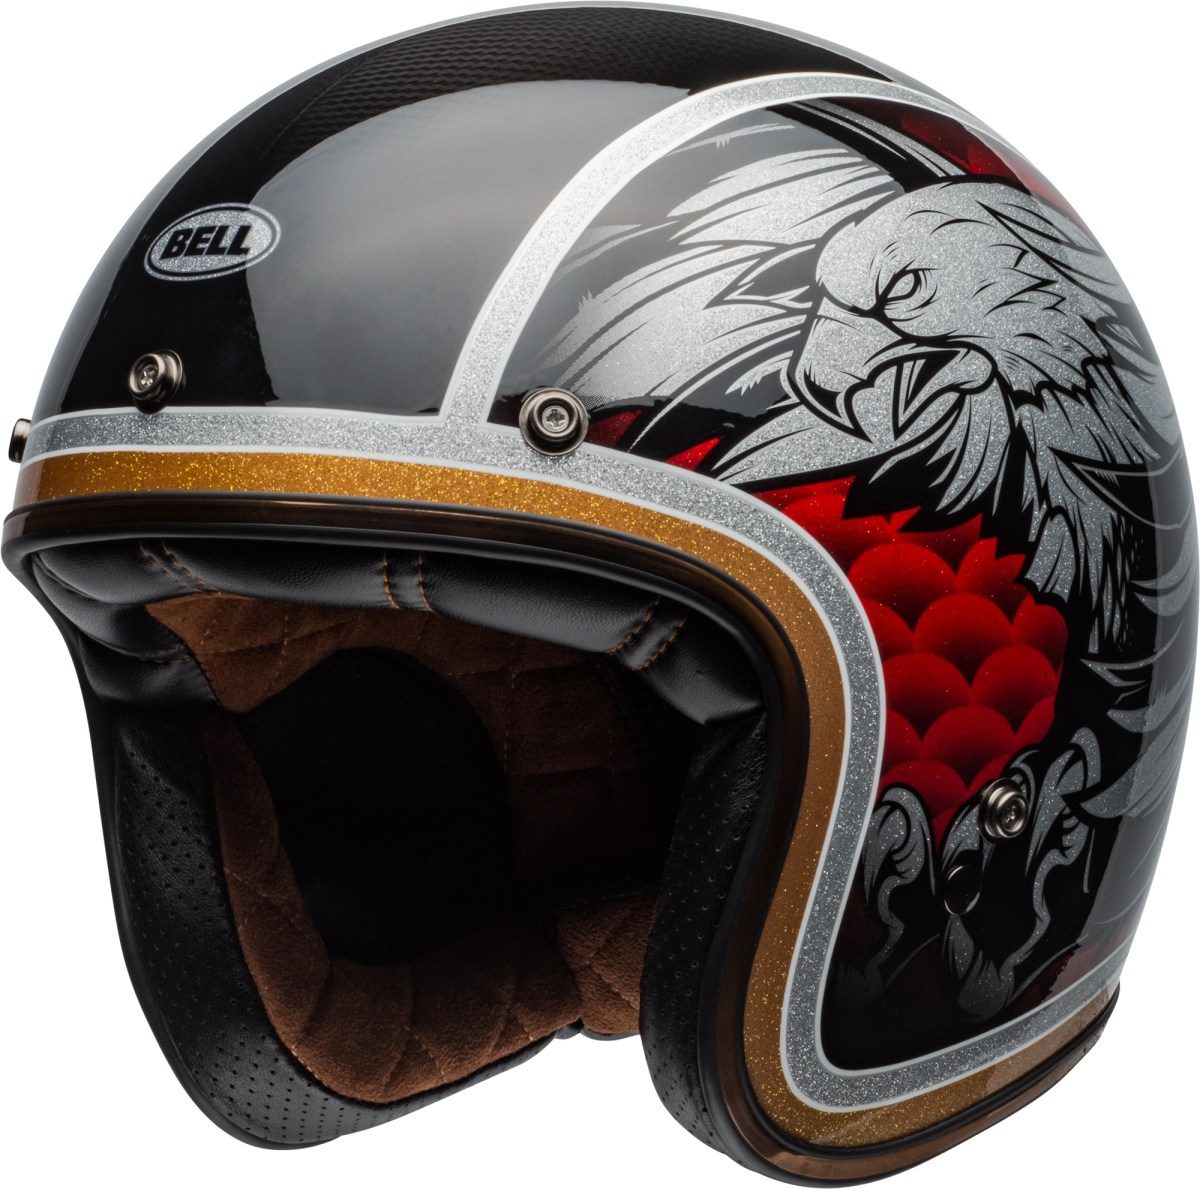 Bell Helmets Unveils 2019 Lineup